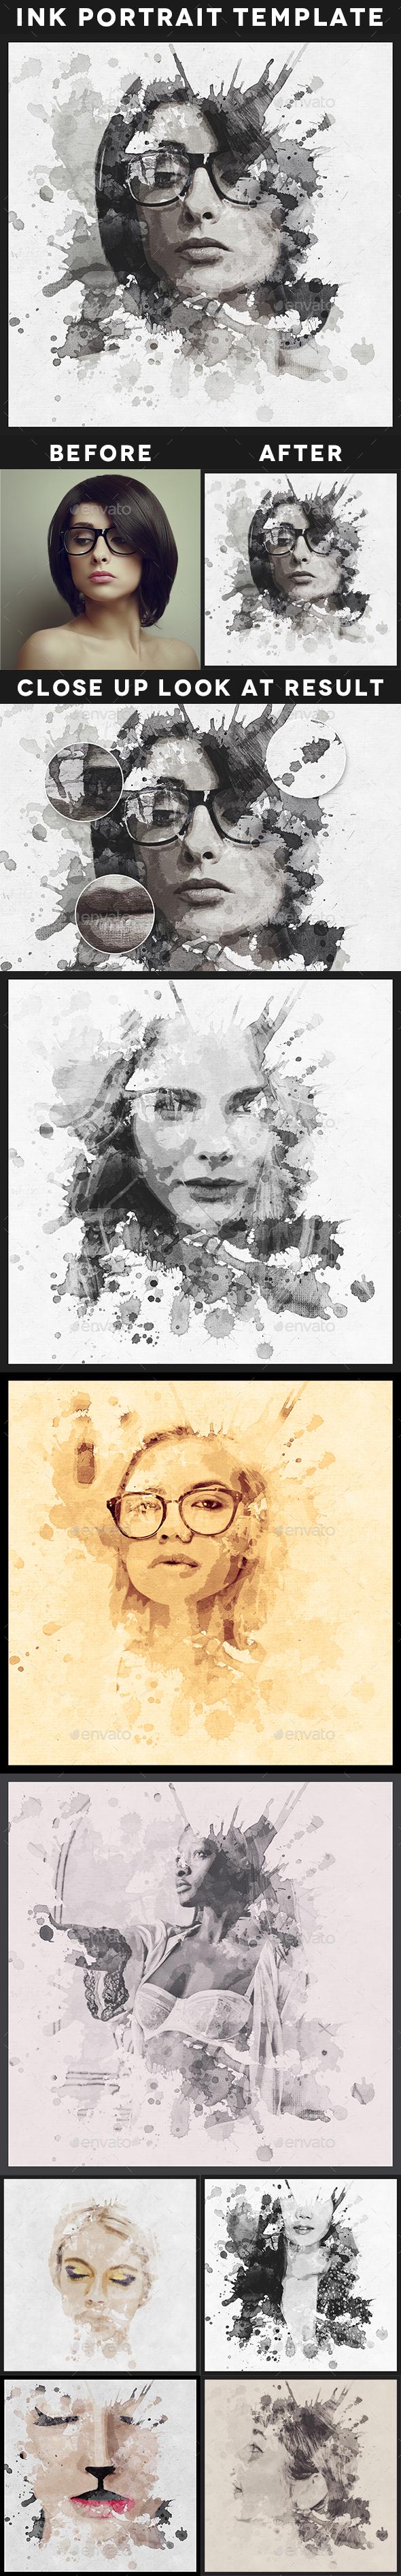 Ink Portrait Template - Artistic Photo Templates